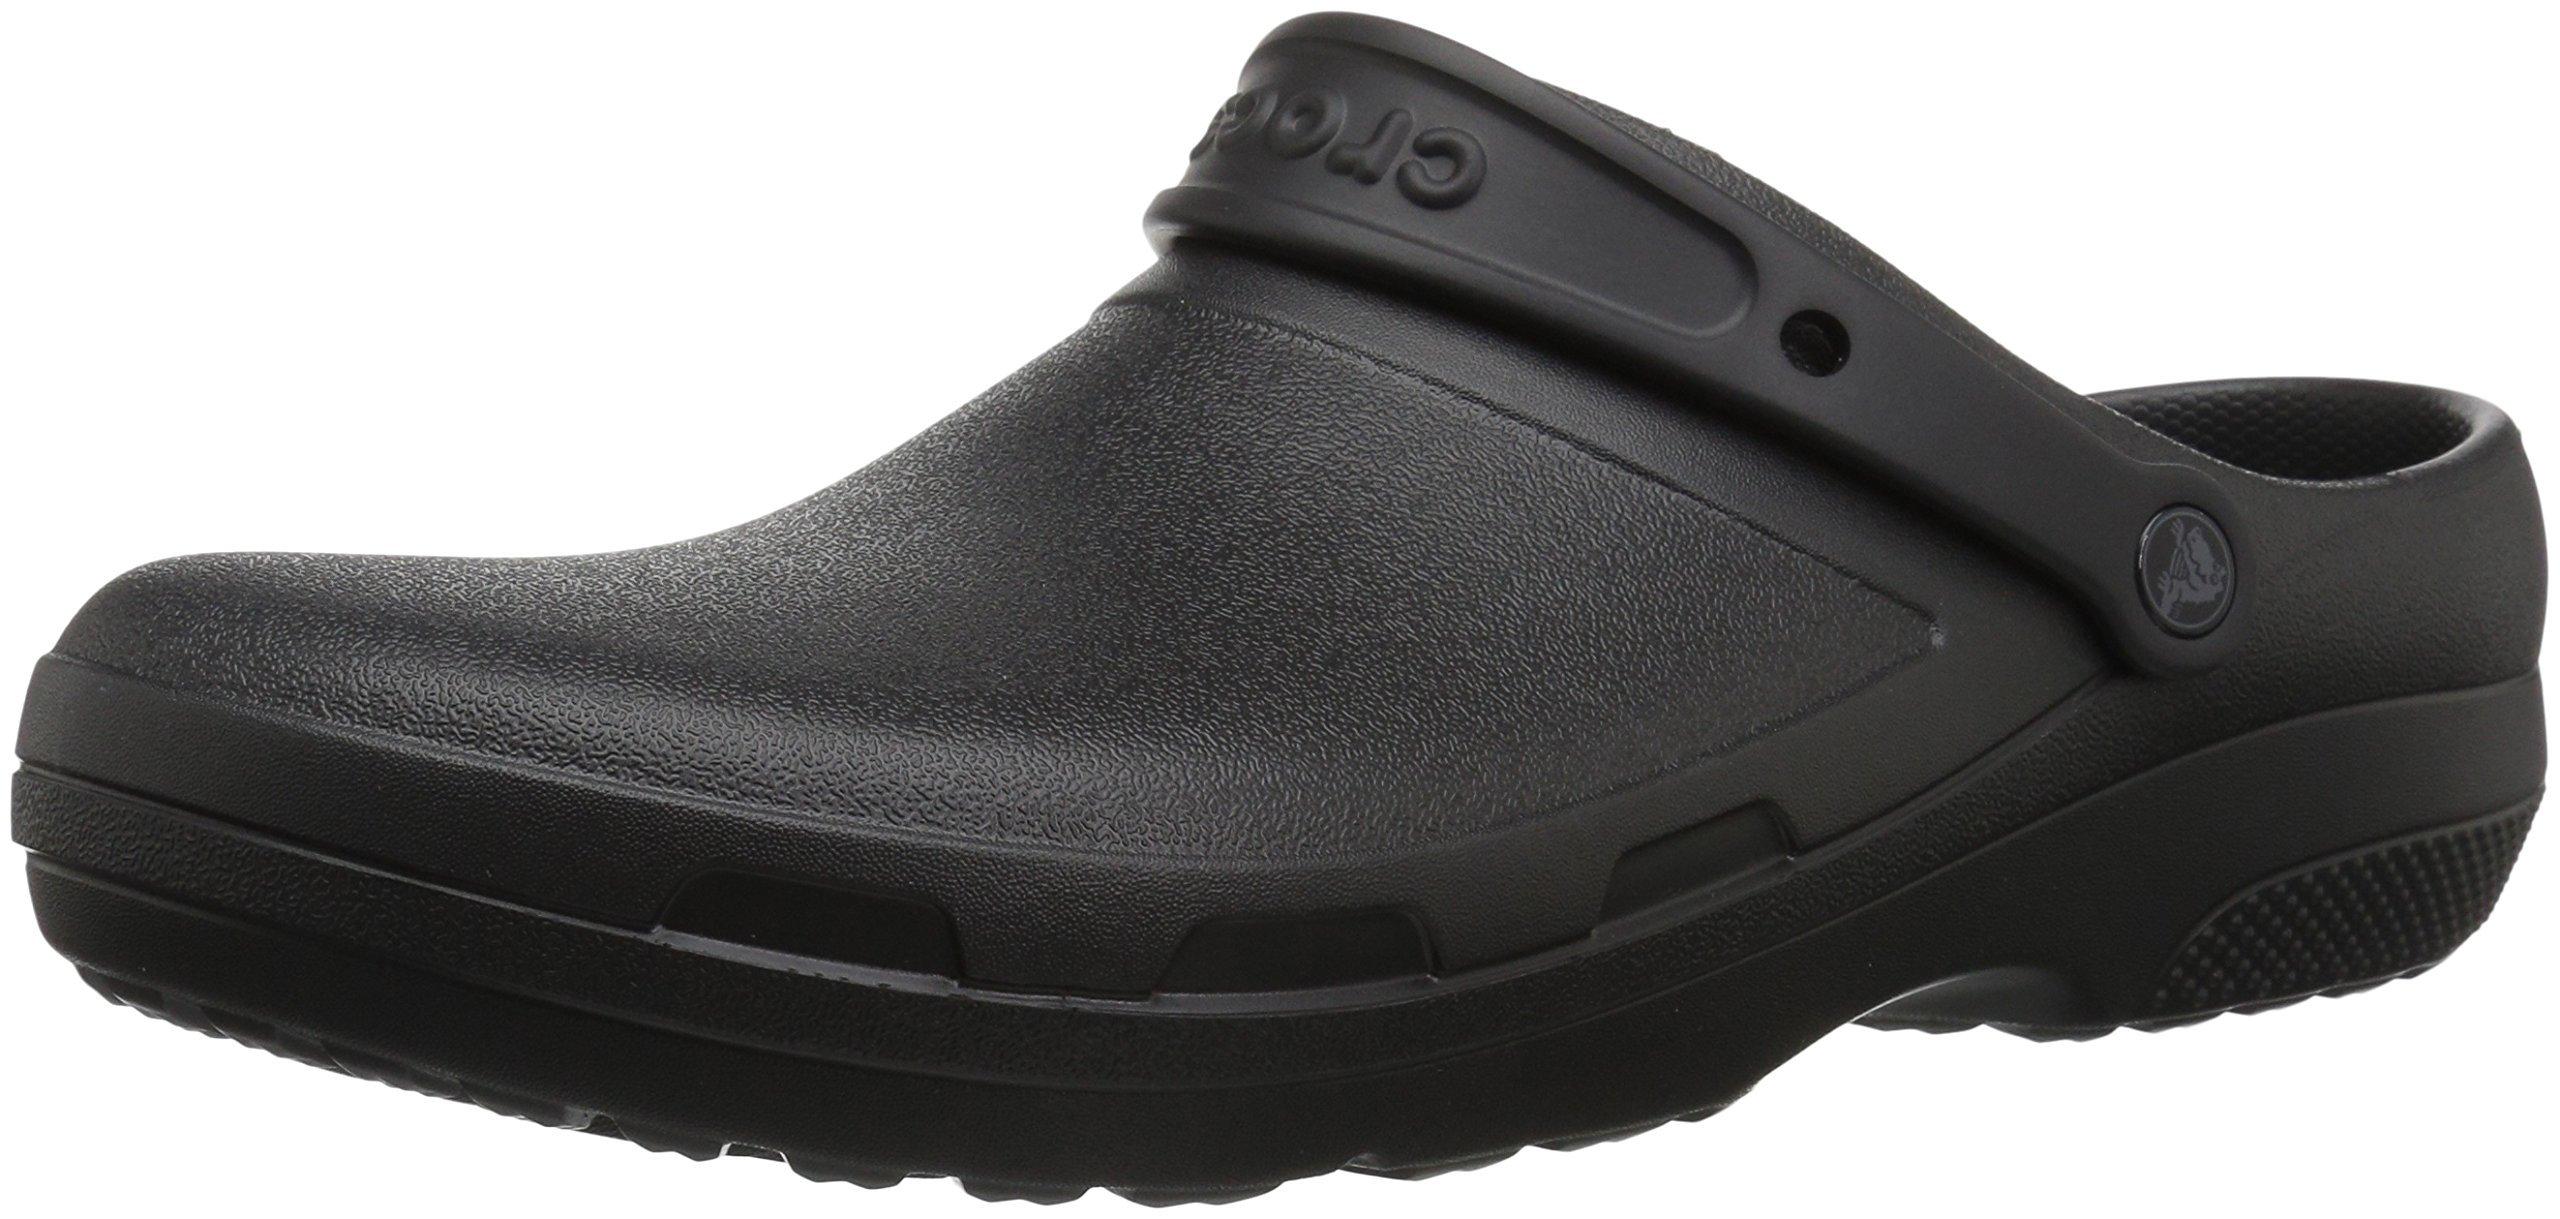 Crocs Specialist II Clog, Black, 9 US Men/11 US Women M US